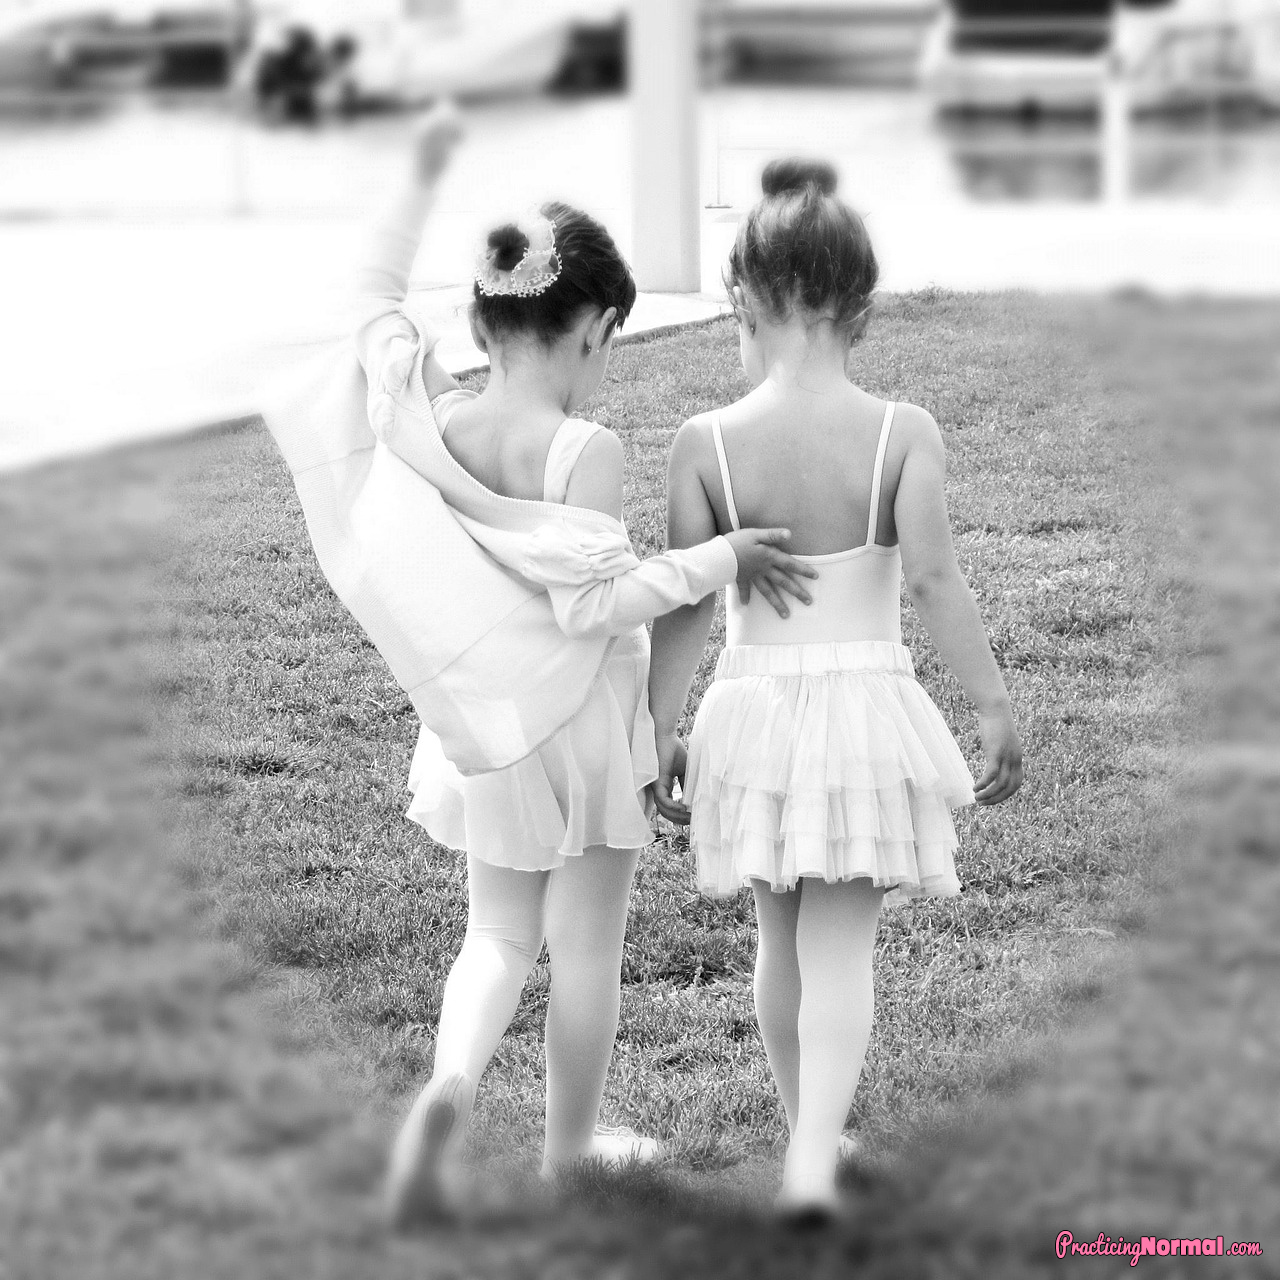 ballet, tips, dance, slippers, dancers, sisters